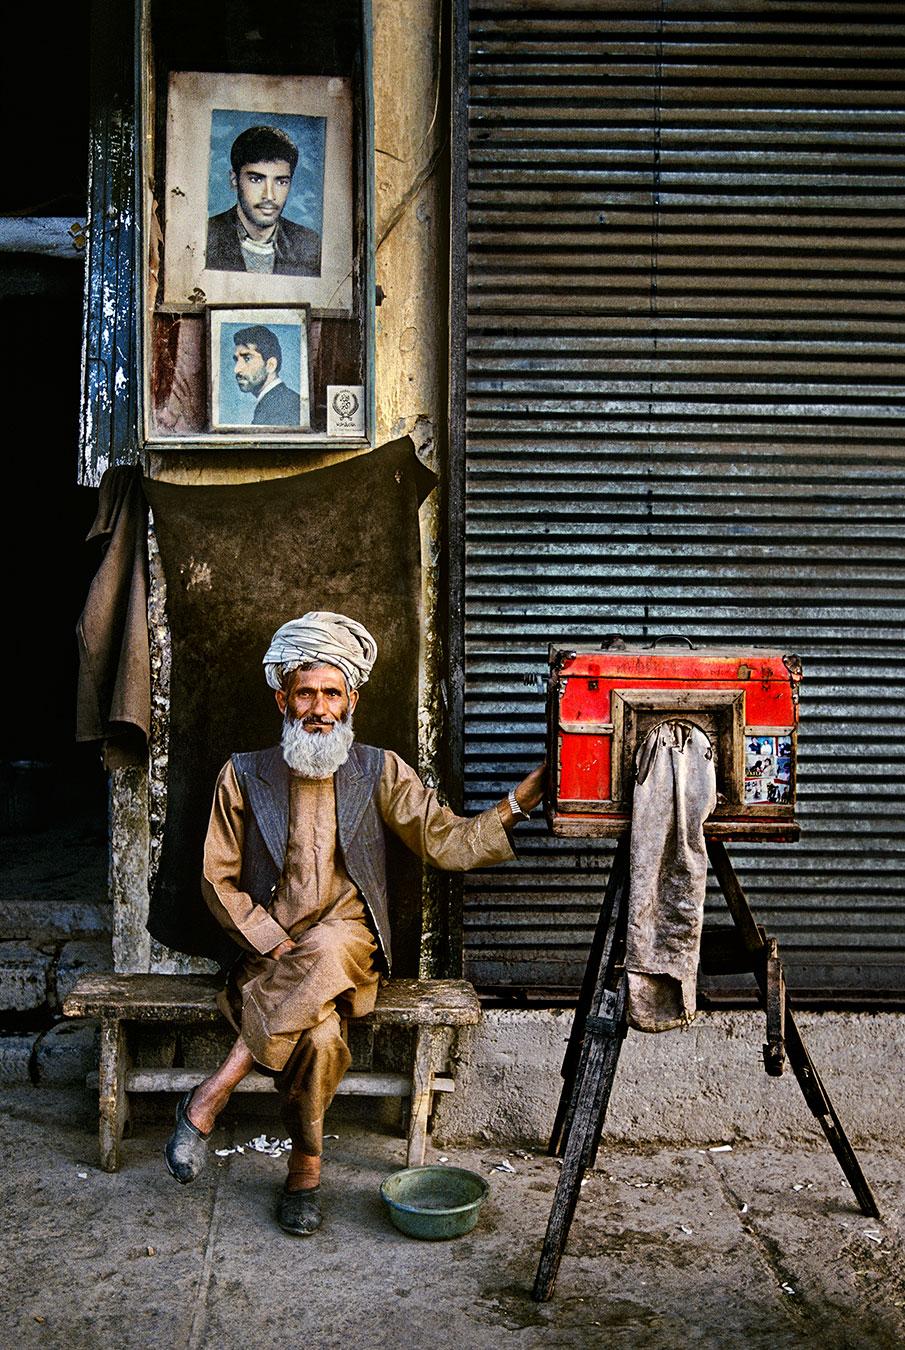 Portrait Photographer. Photo by Steve McCurry.